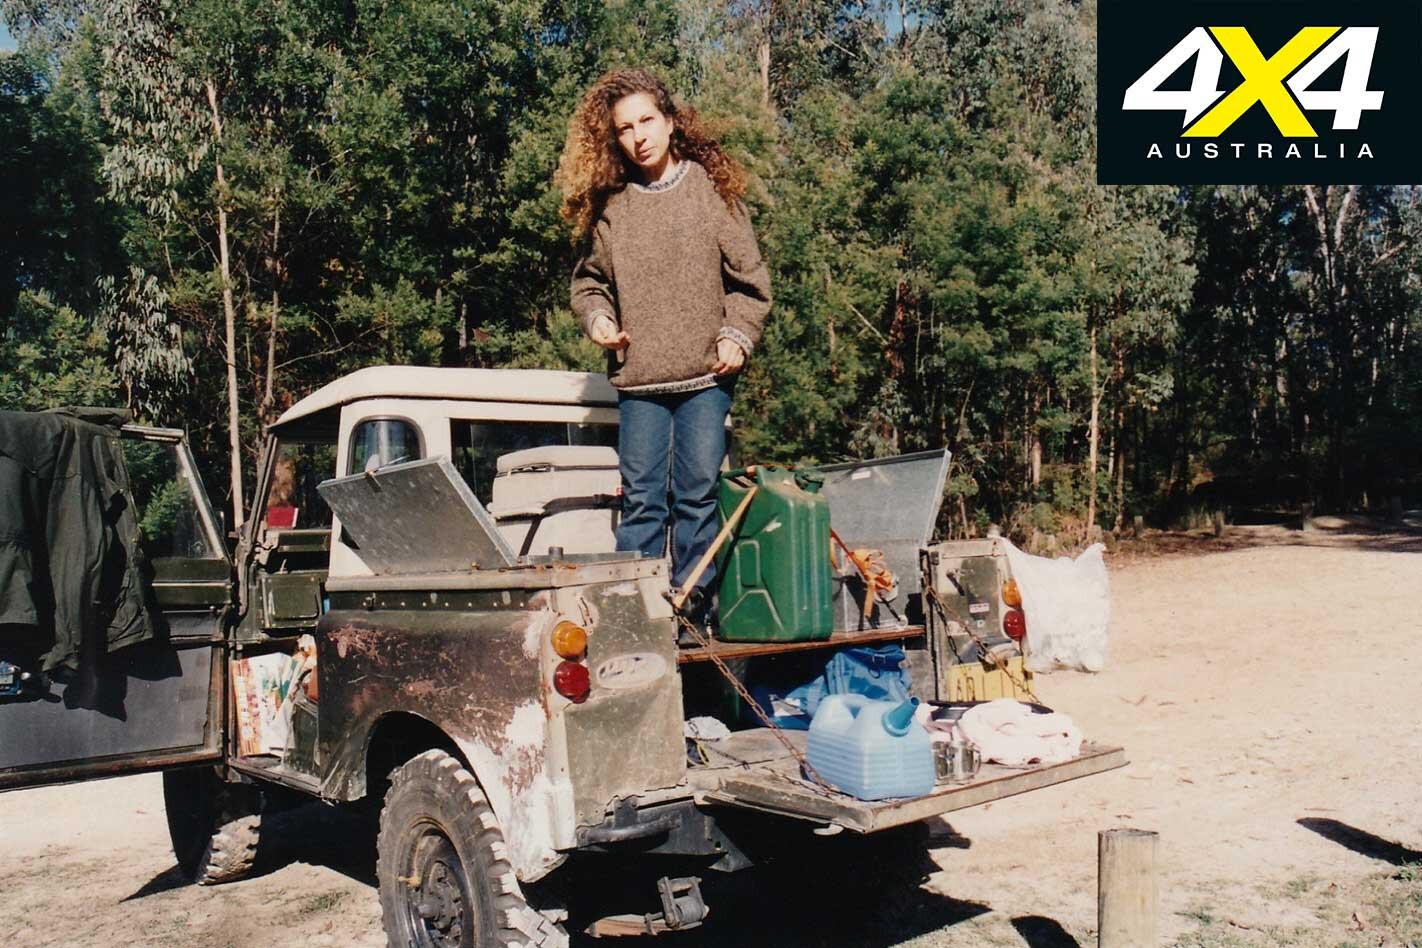 1971 Land Rover Series IIA Jpg